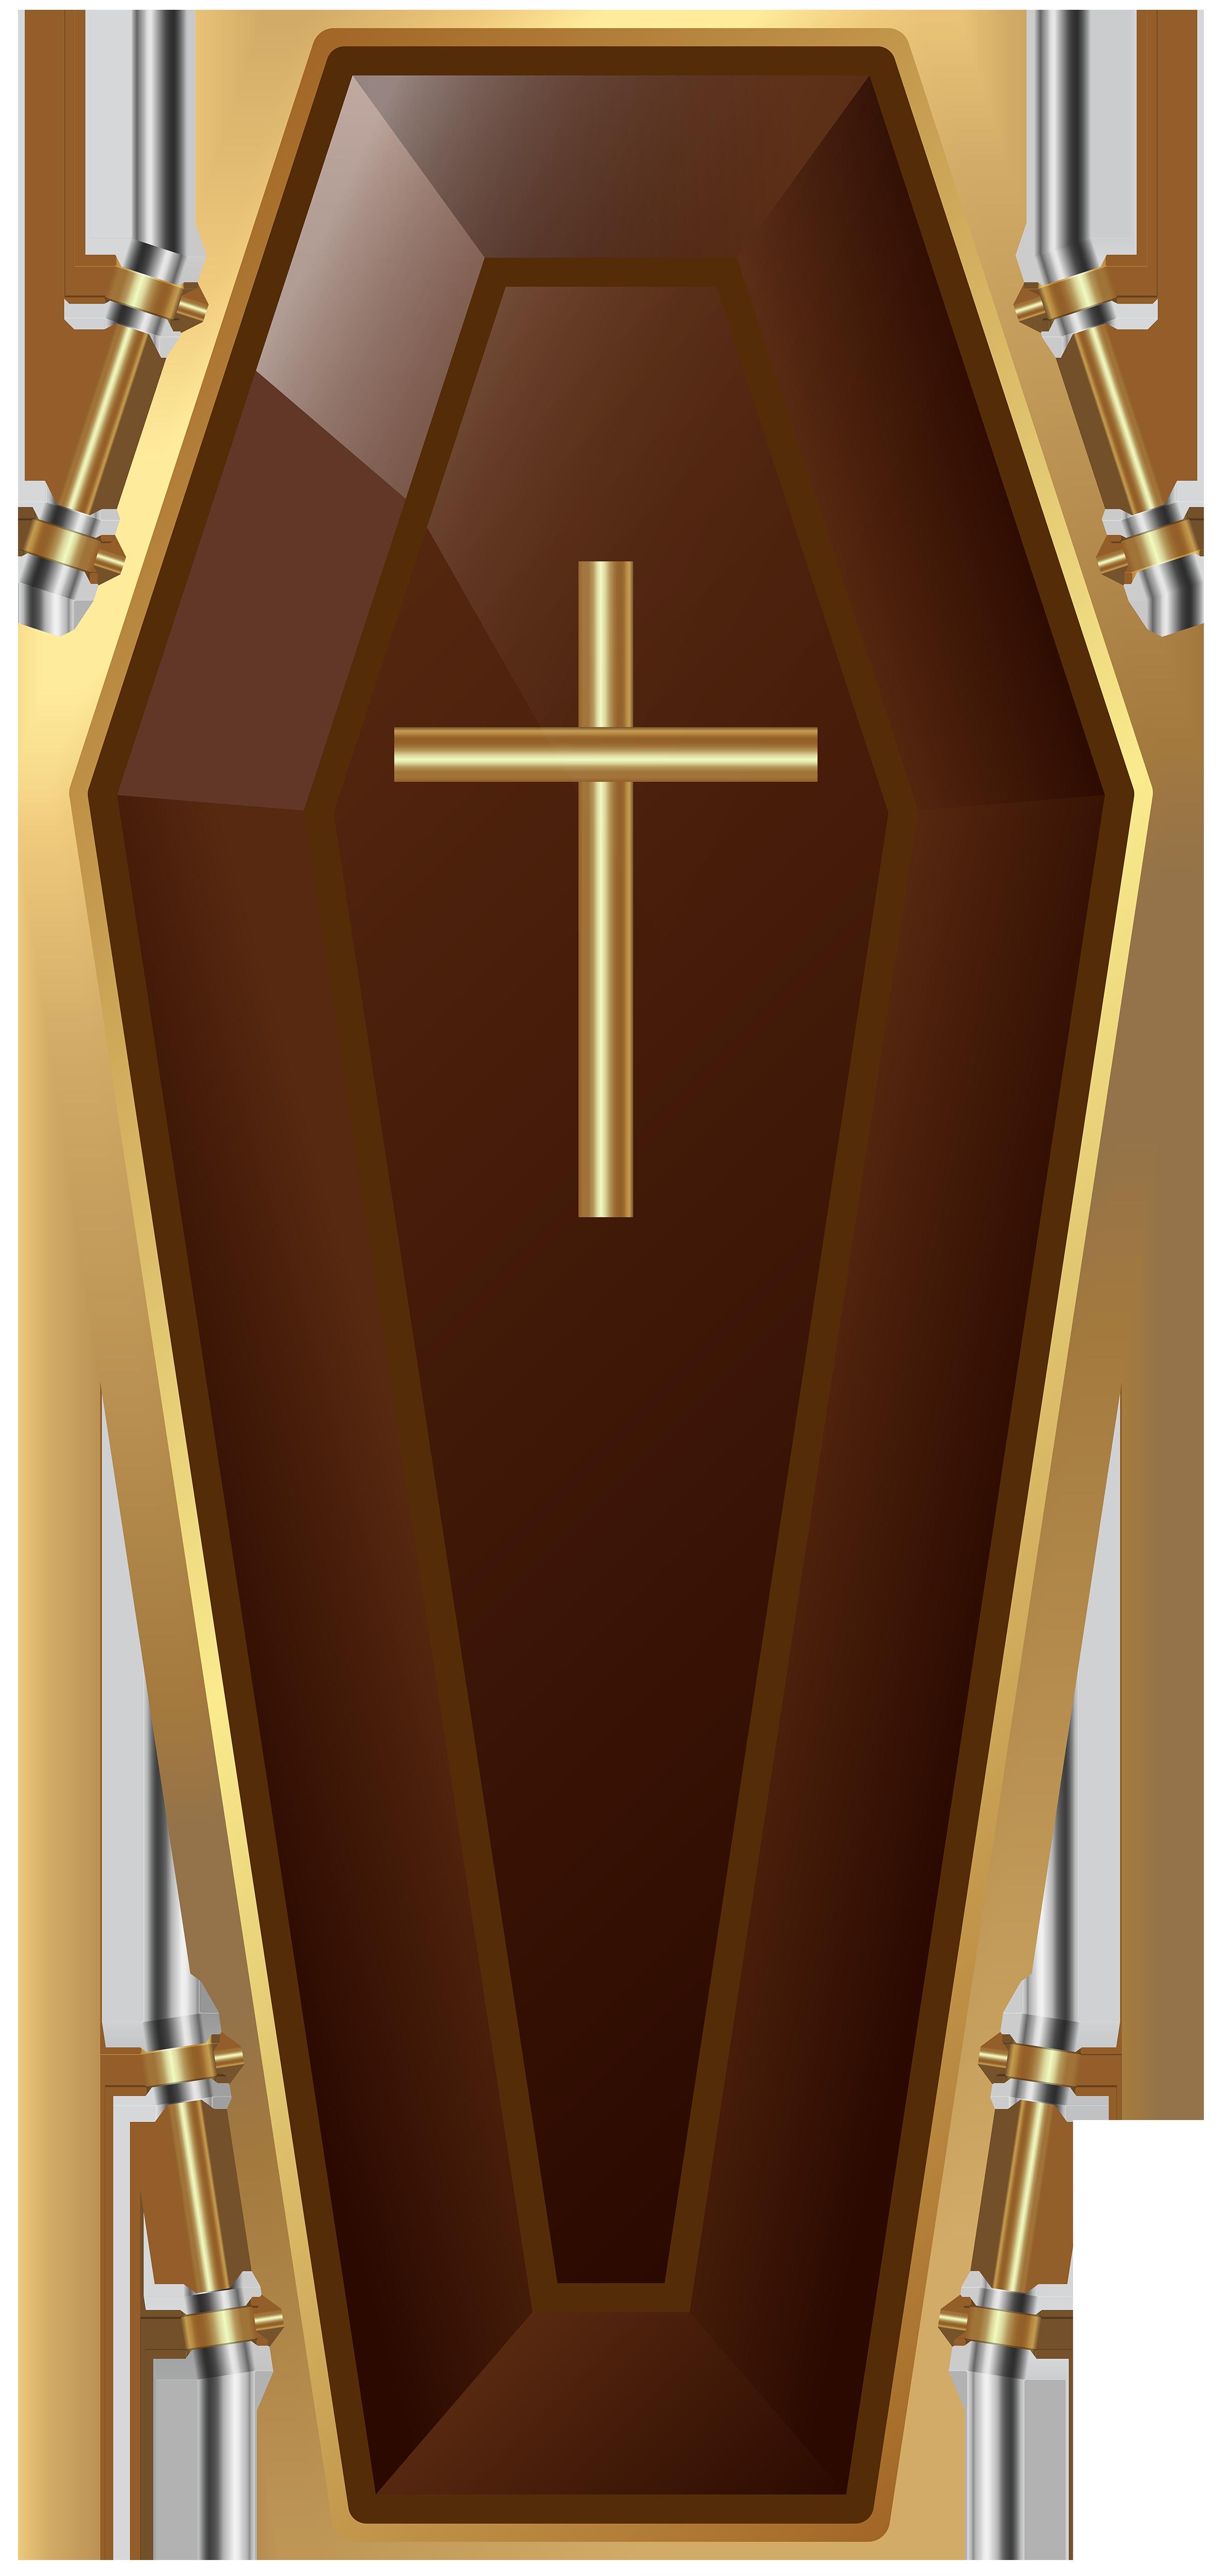 Crucifix clipart pink cross. Brown coffin transparent png